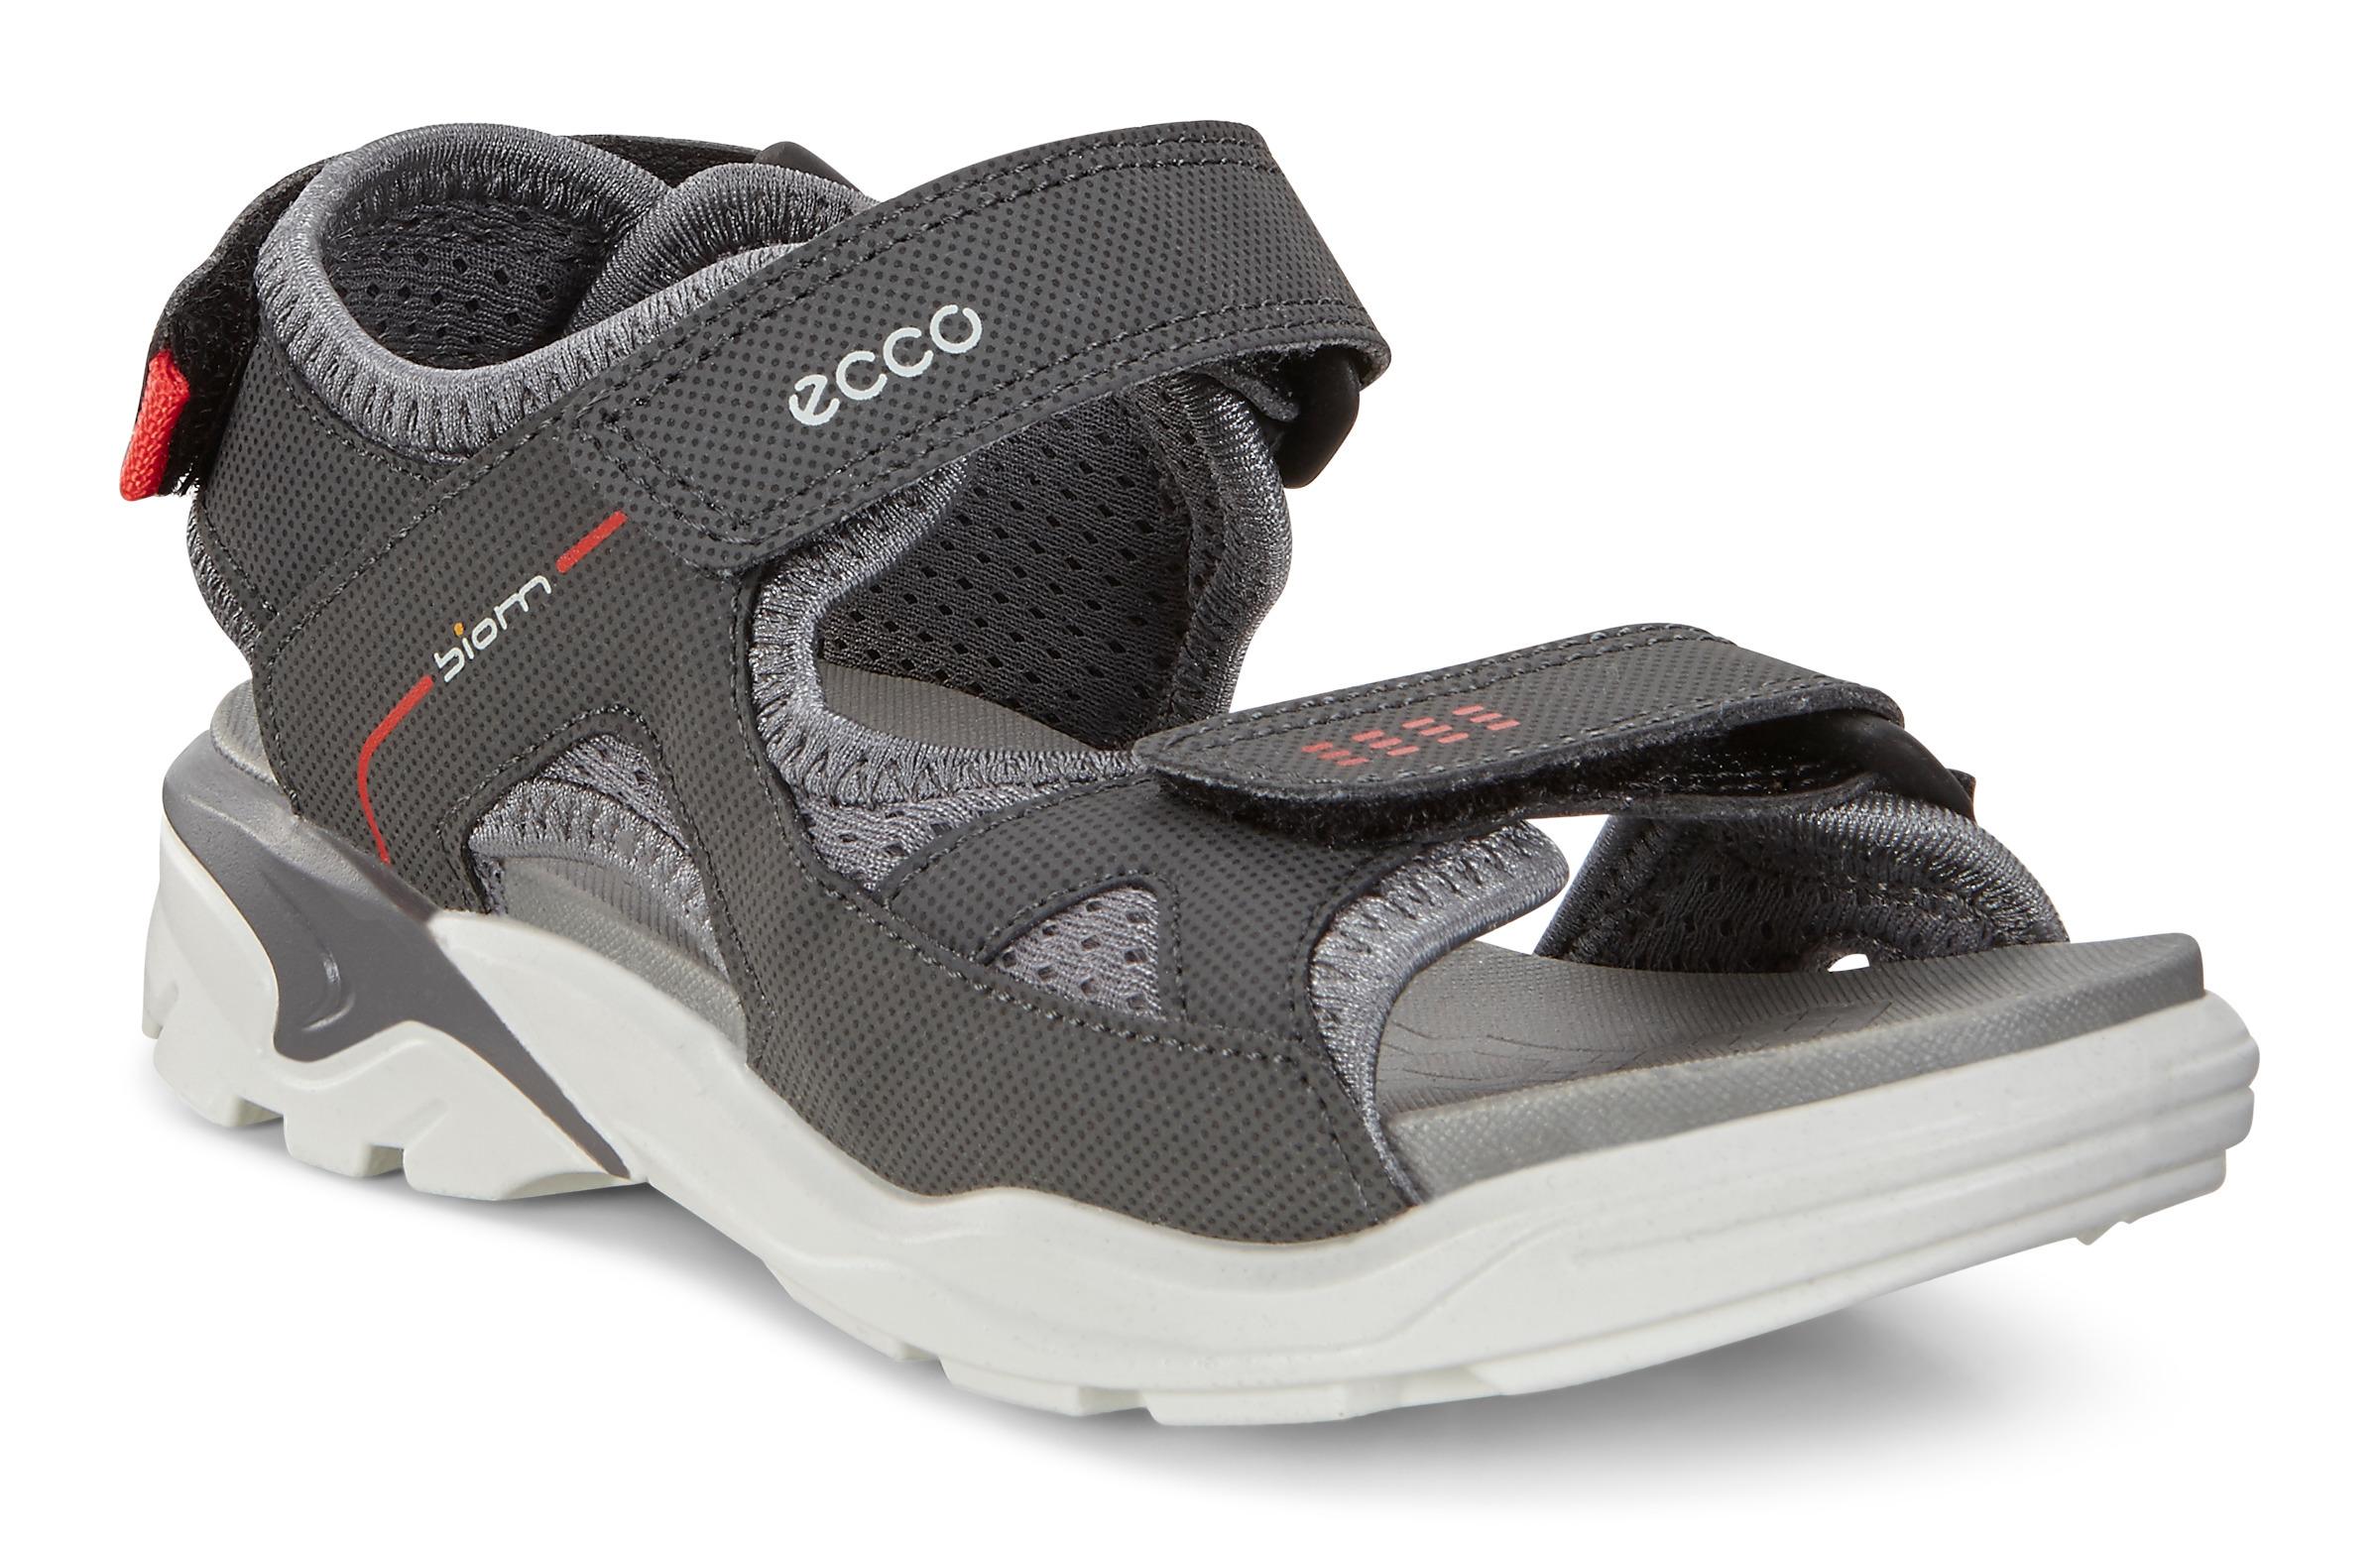 Ecco Biom Terrain Sandals